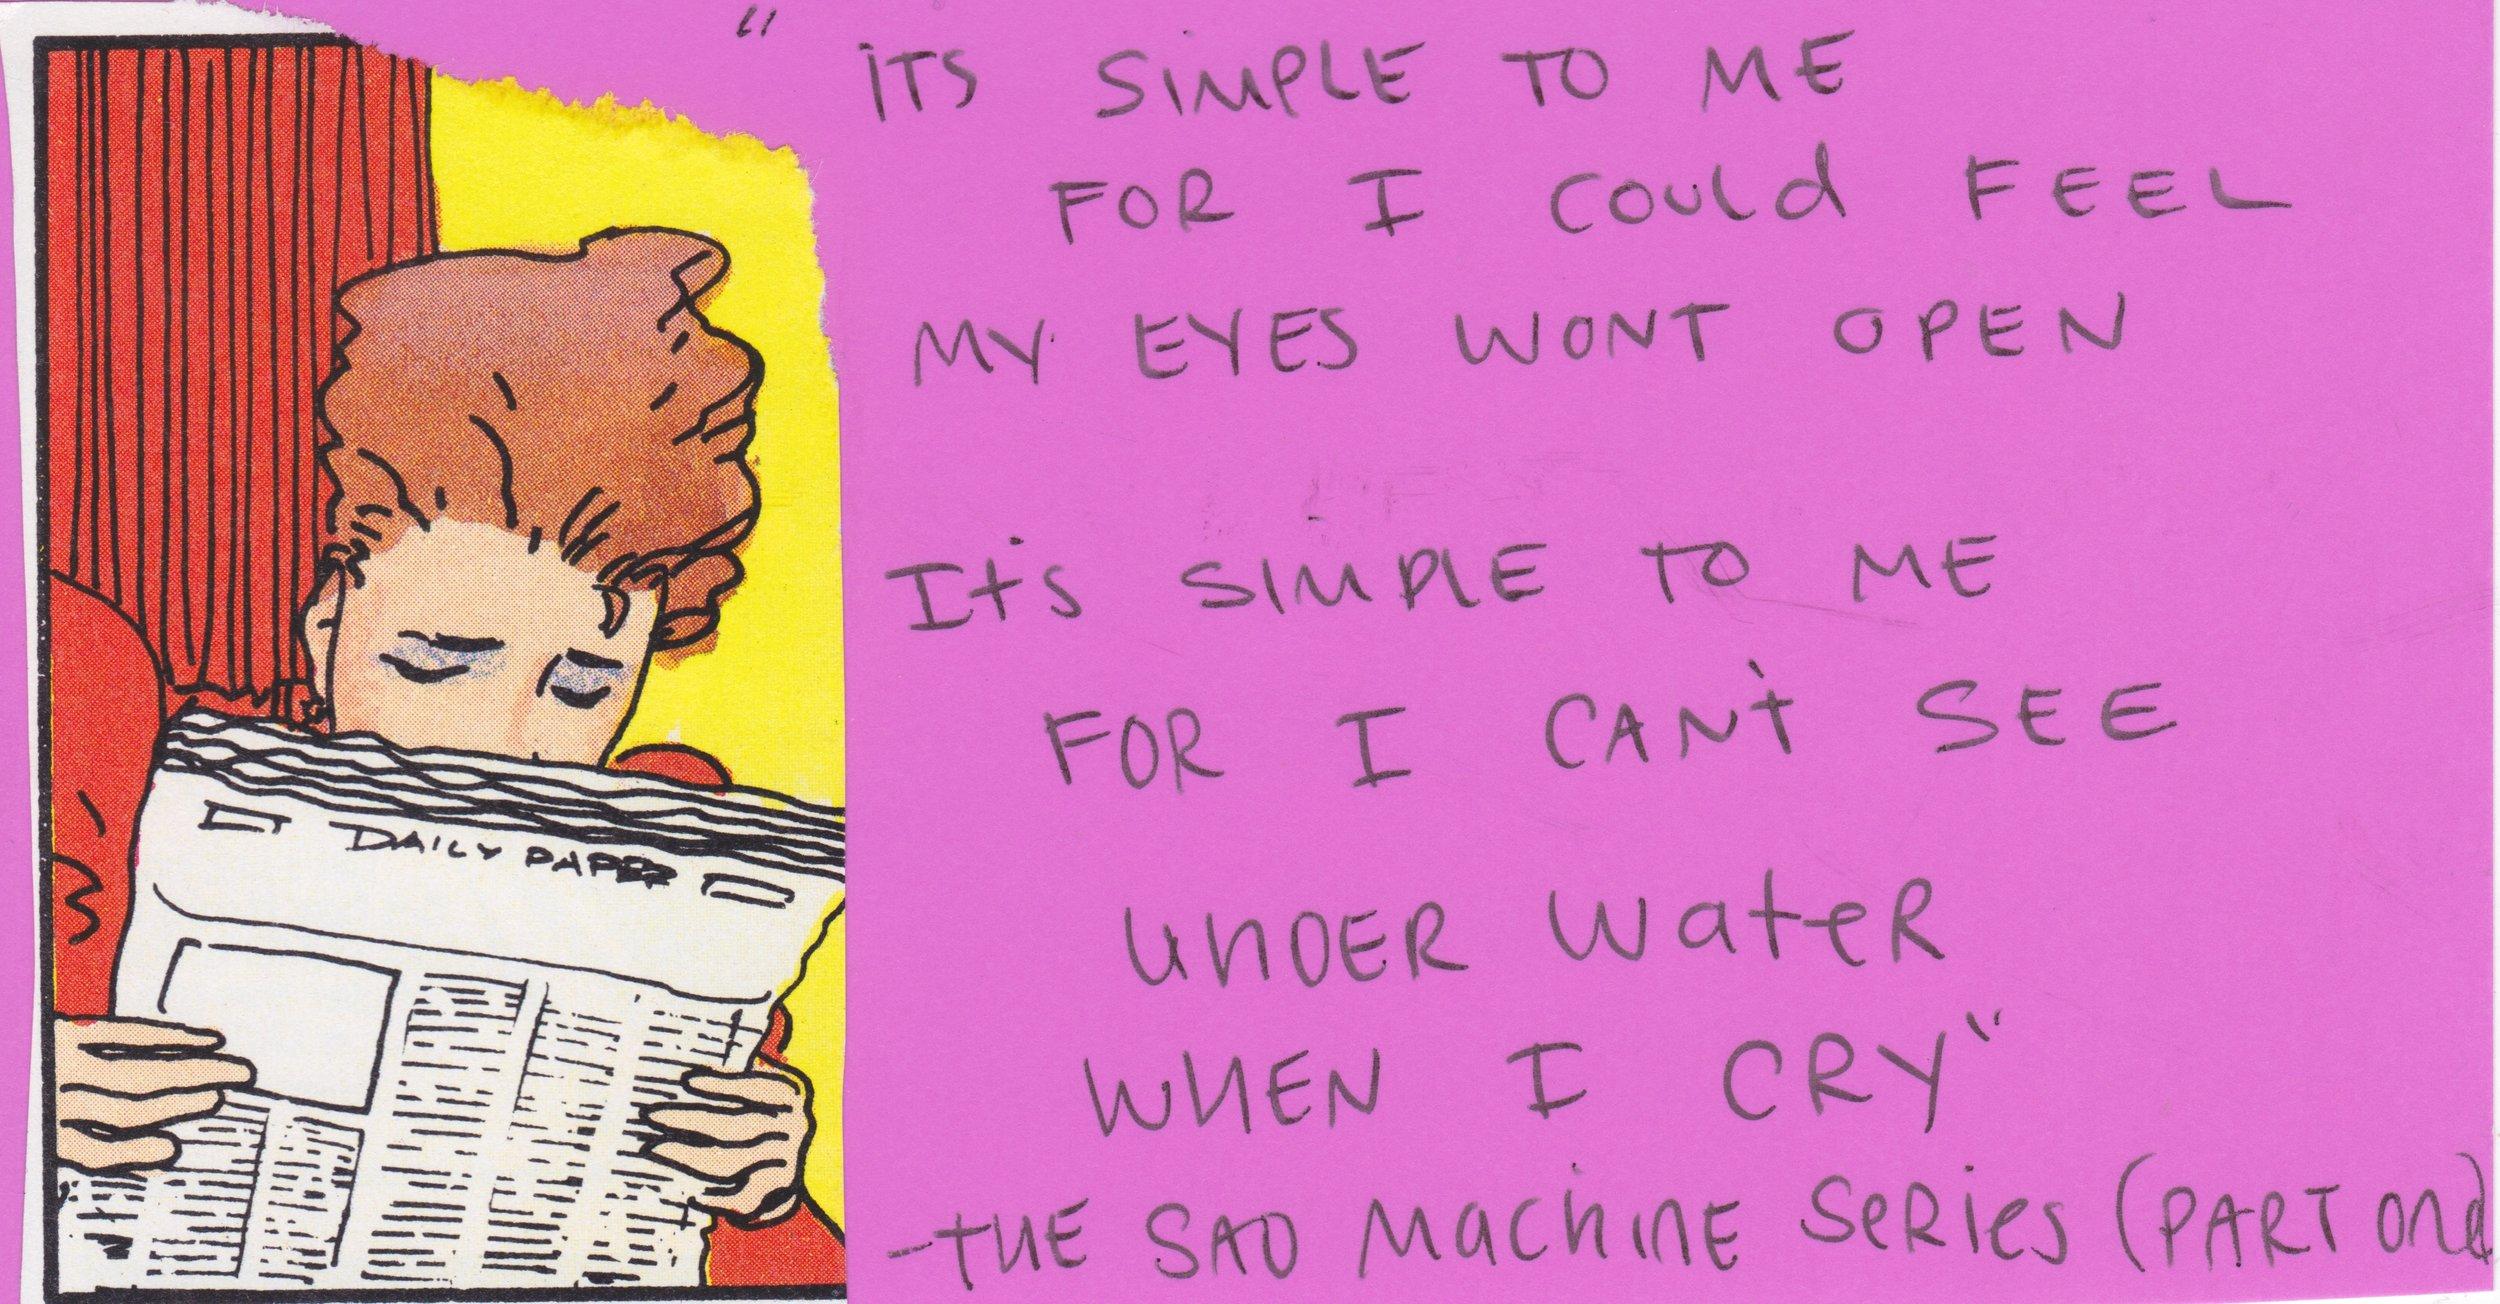 The Sad Machine Series Quotes 22.jpeg